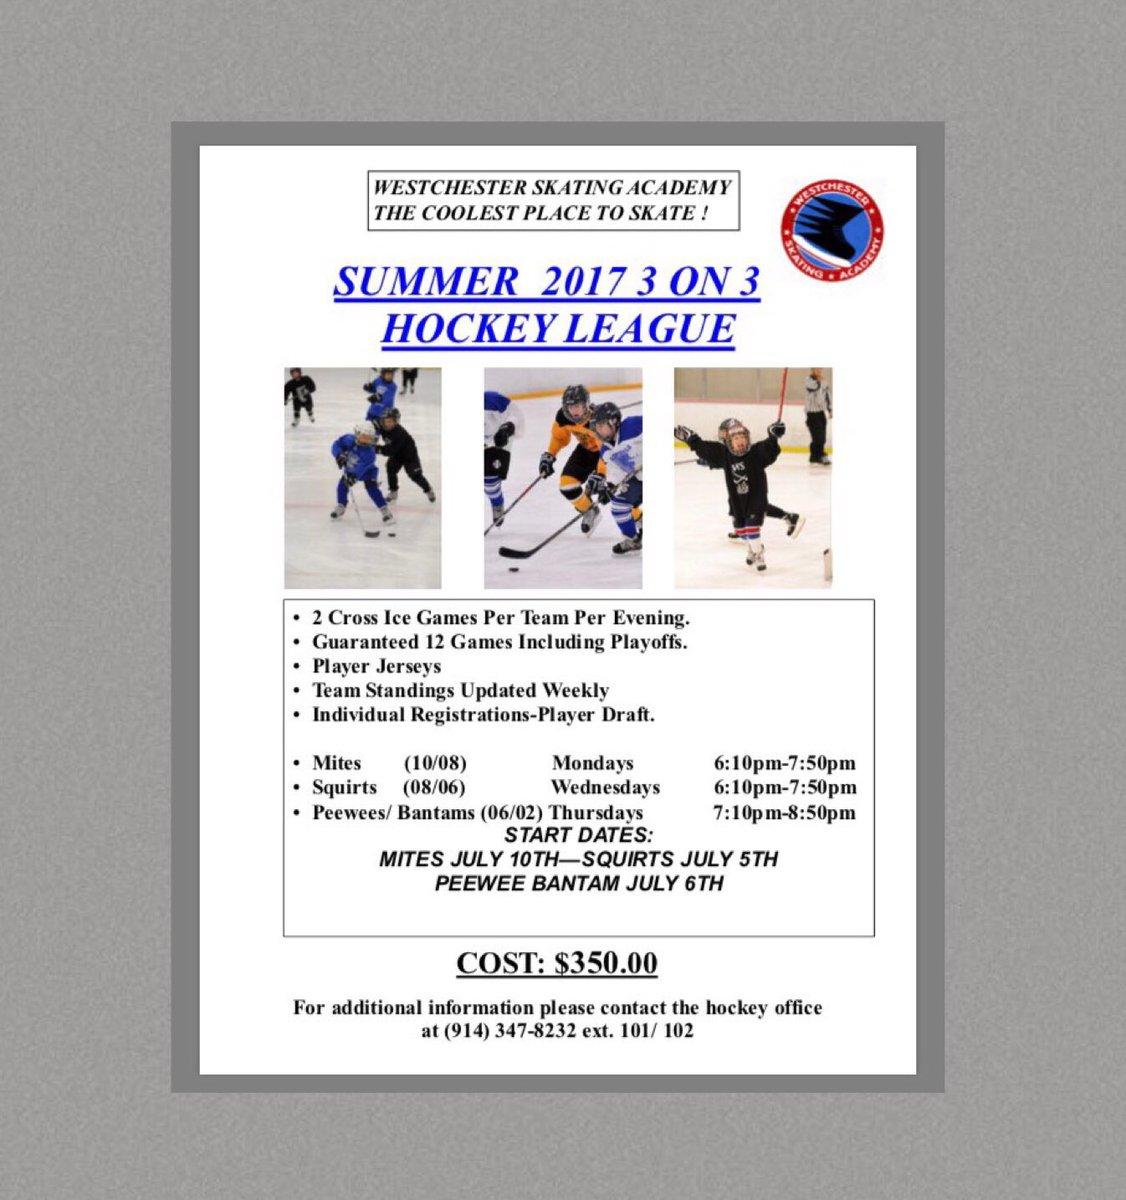 Roller skating rink westchester - 0 Replies 2 Retweets 6 Likes